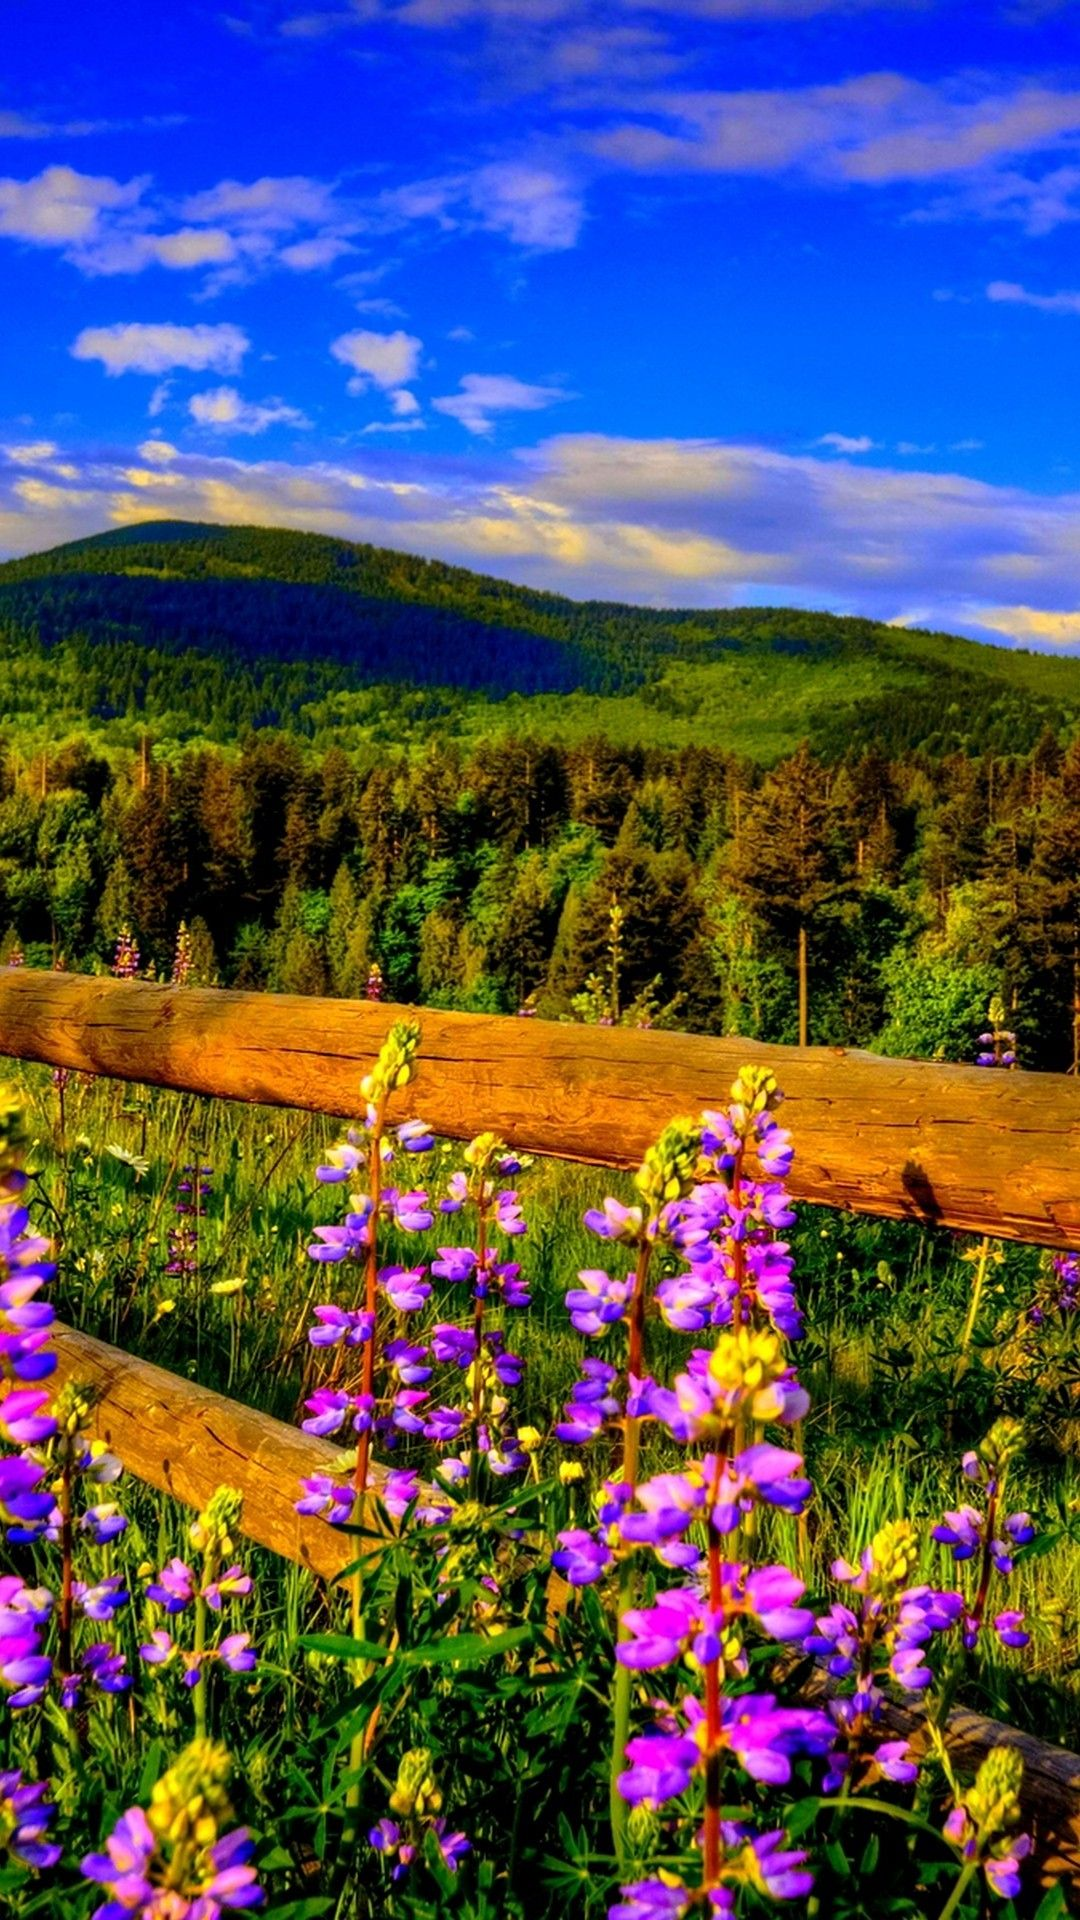 Spring Season Cellphone Wallpaper Best HD Wallpapers